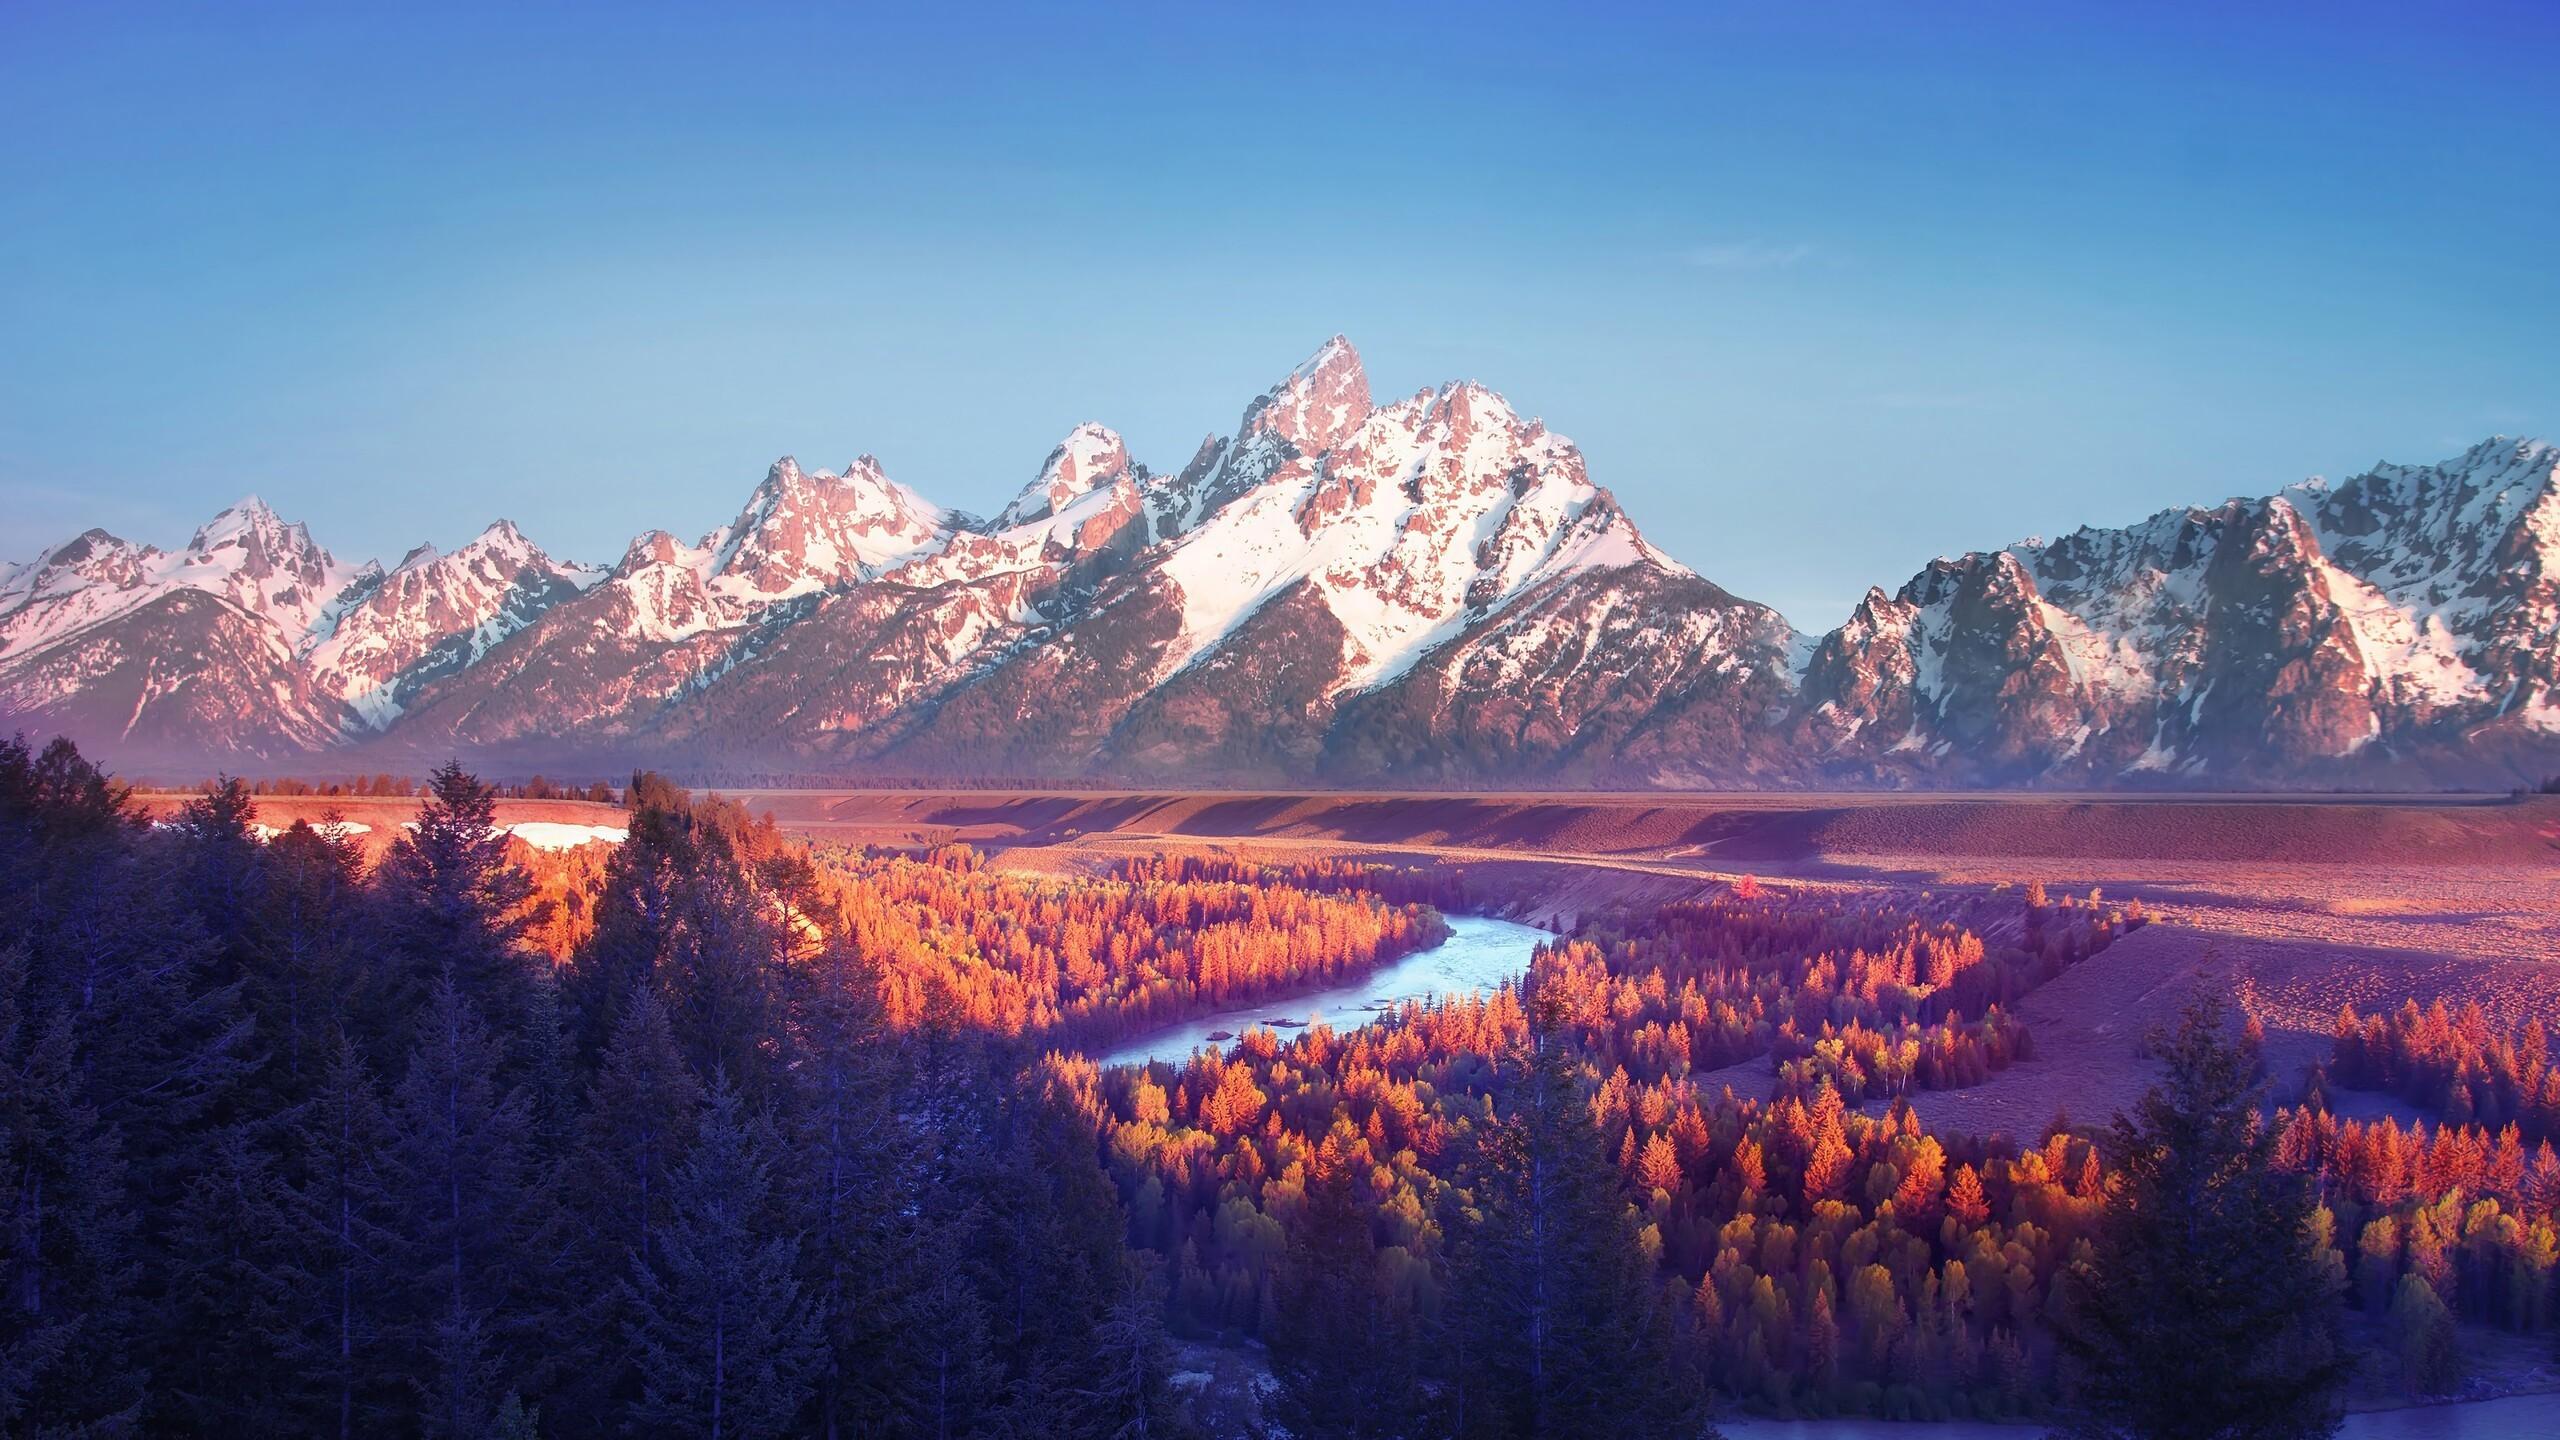 2560x1440 Grand Teton National Park 4k 1440p Resolution Hd 4k